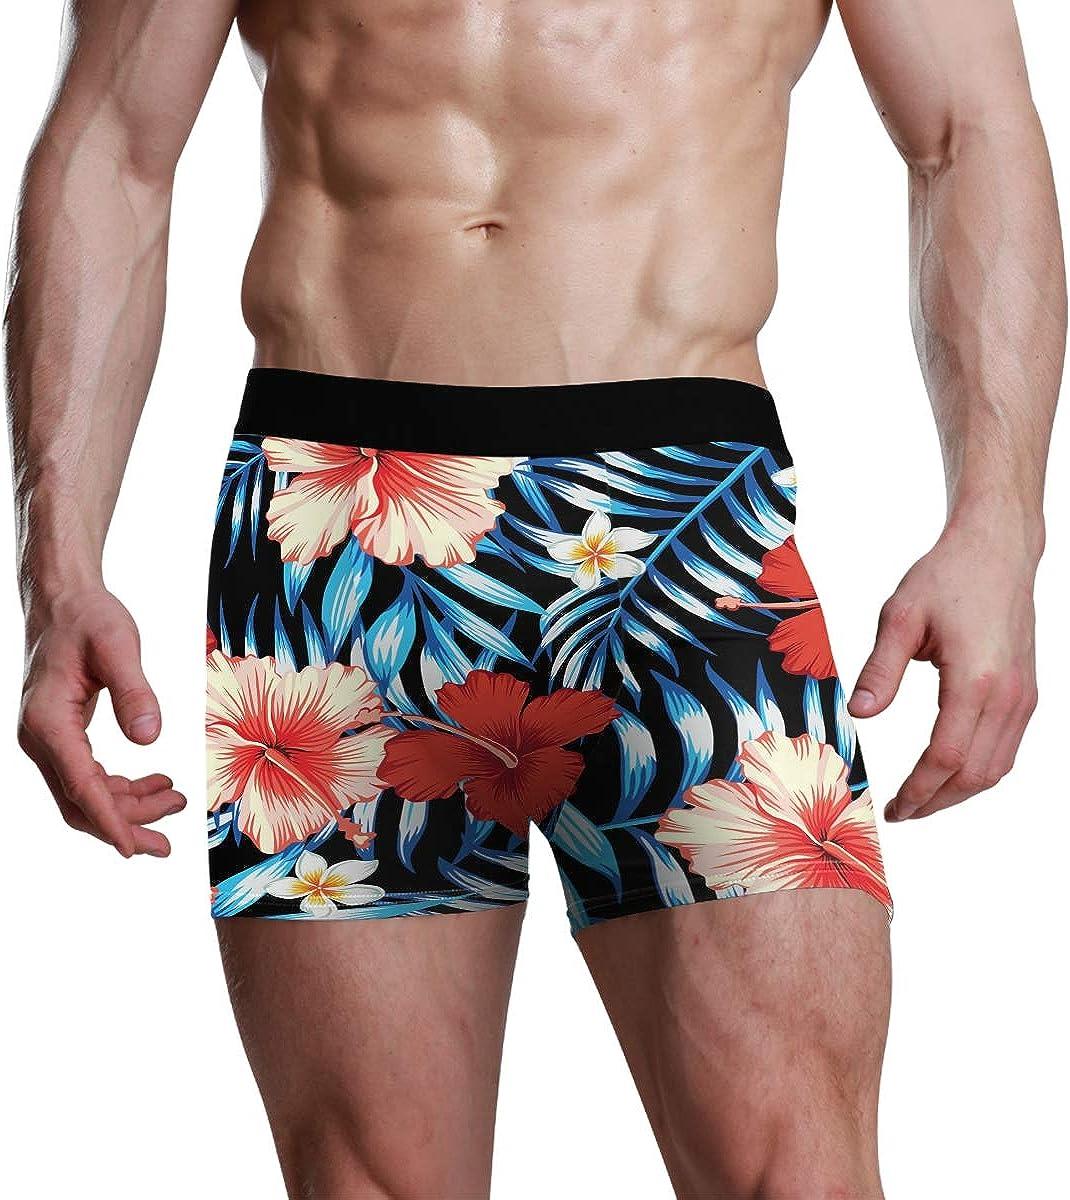 Men's Boxer Briefs Hawaii Tropical Natural Floral Seamless Pattern Bikini Underwear Stretch Trunks Boys Underpants